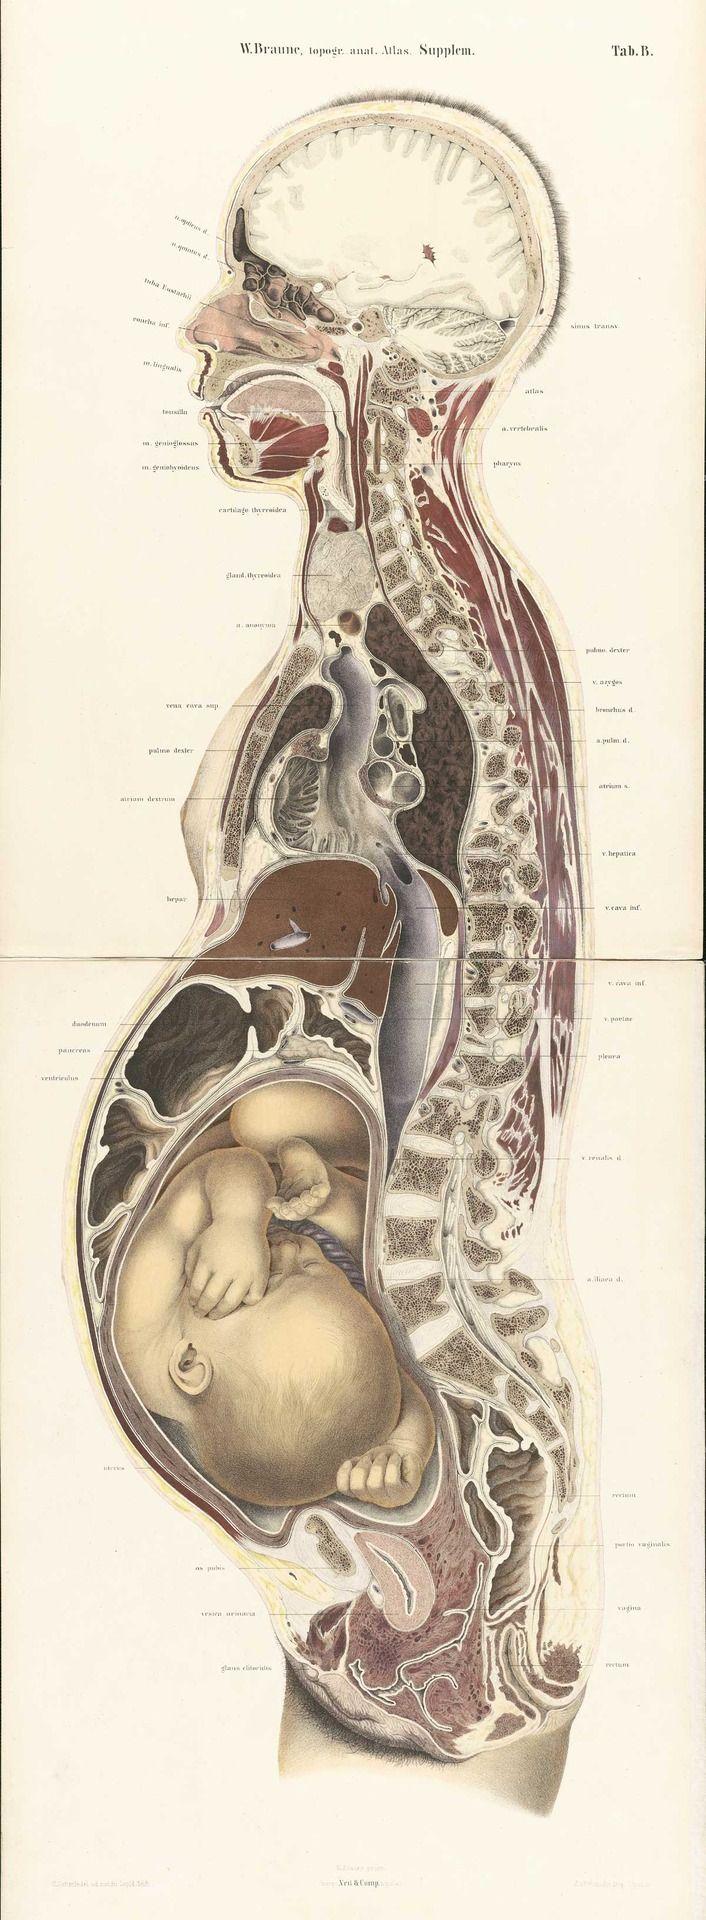 scientific illustration | anatomy | Pinterest | Illustrations ...